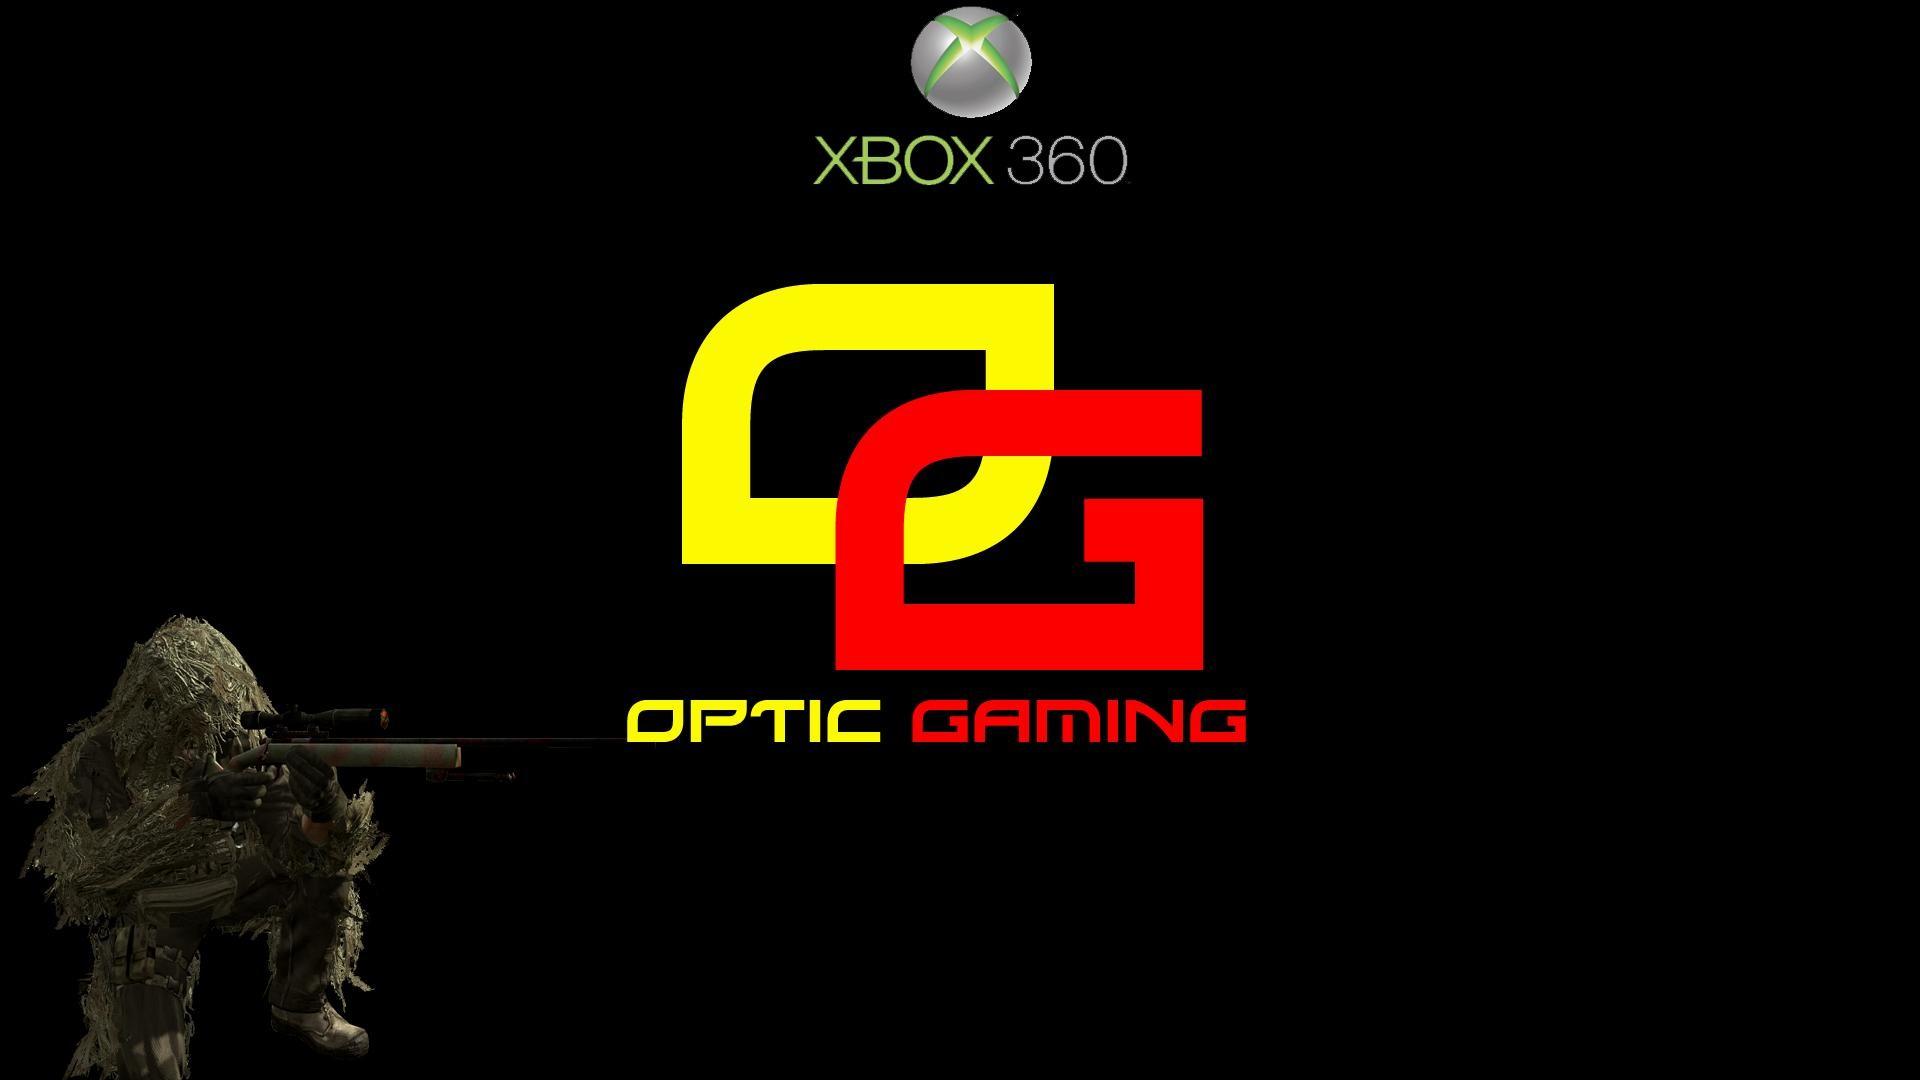 Optic-gaming-xbox-360